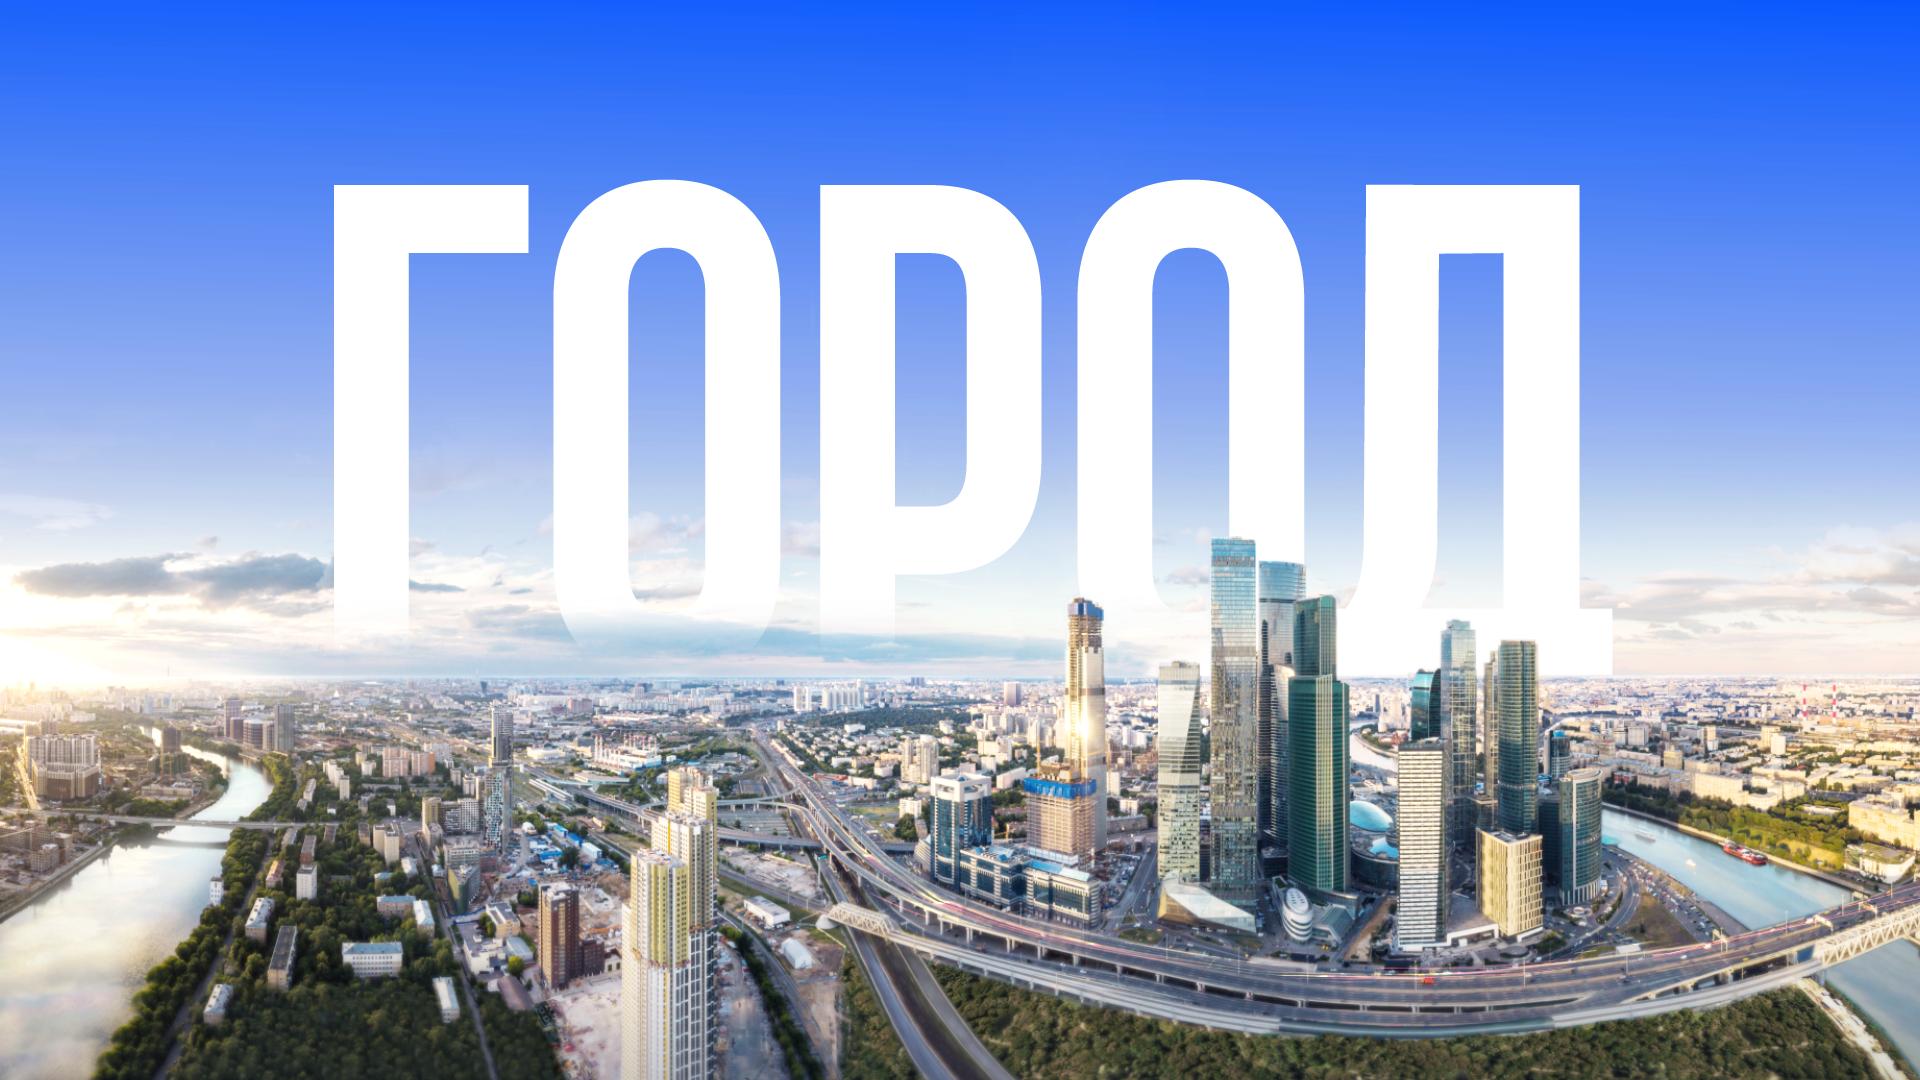 Programme: Город